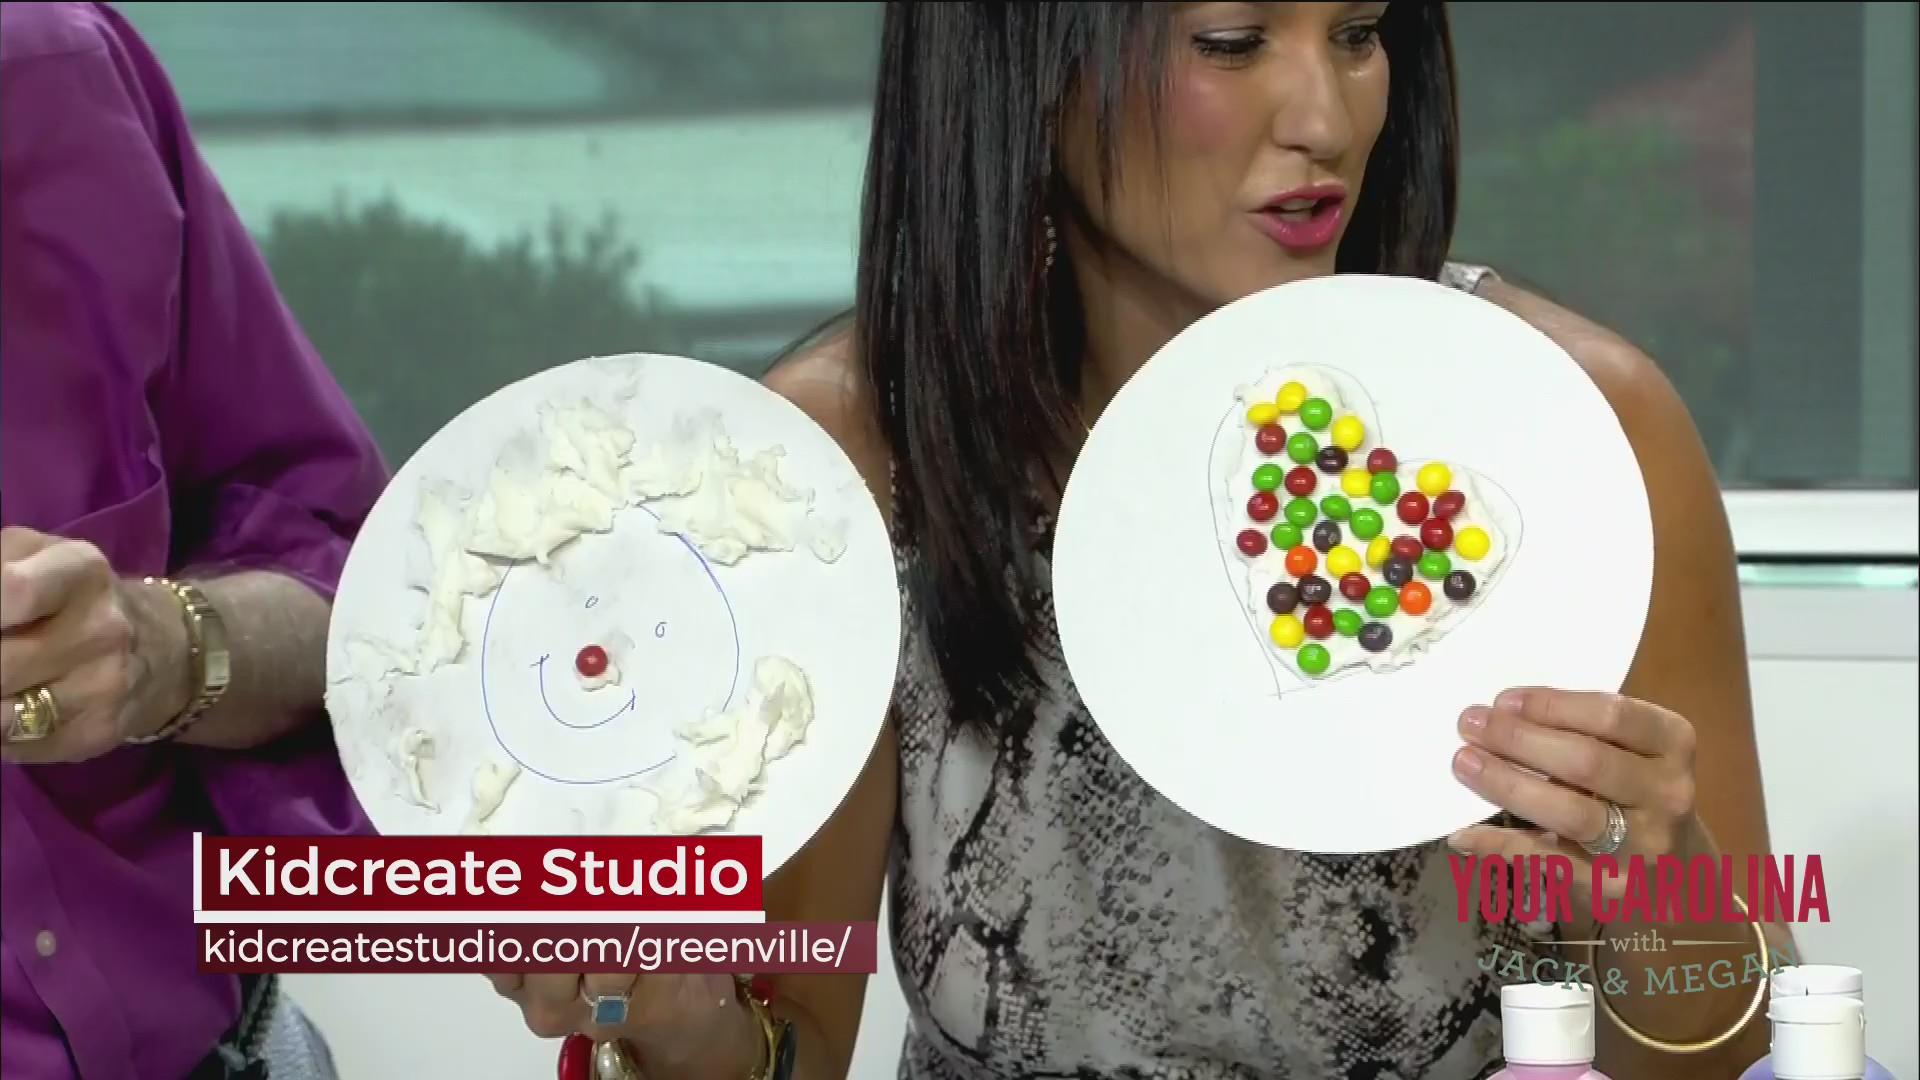 Getting Creative with Kidcreate Studio